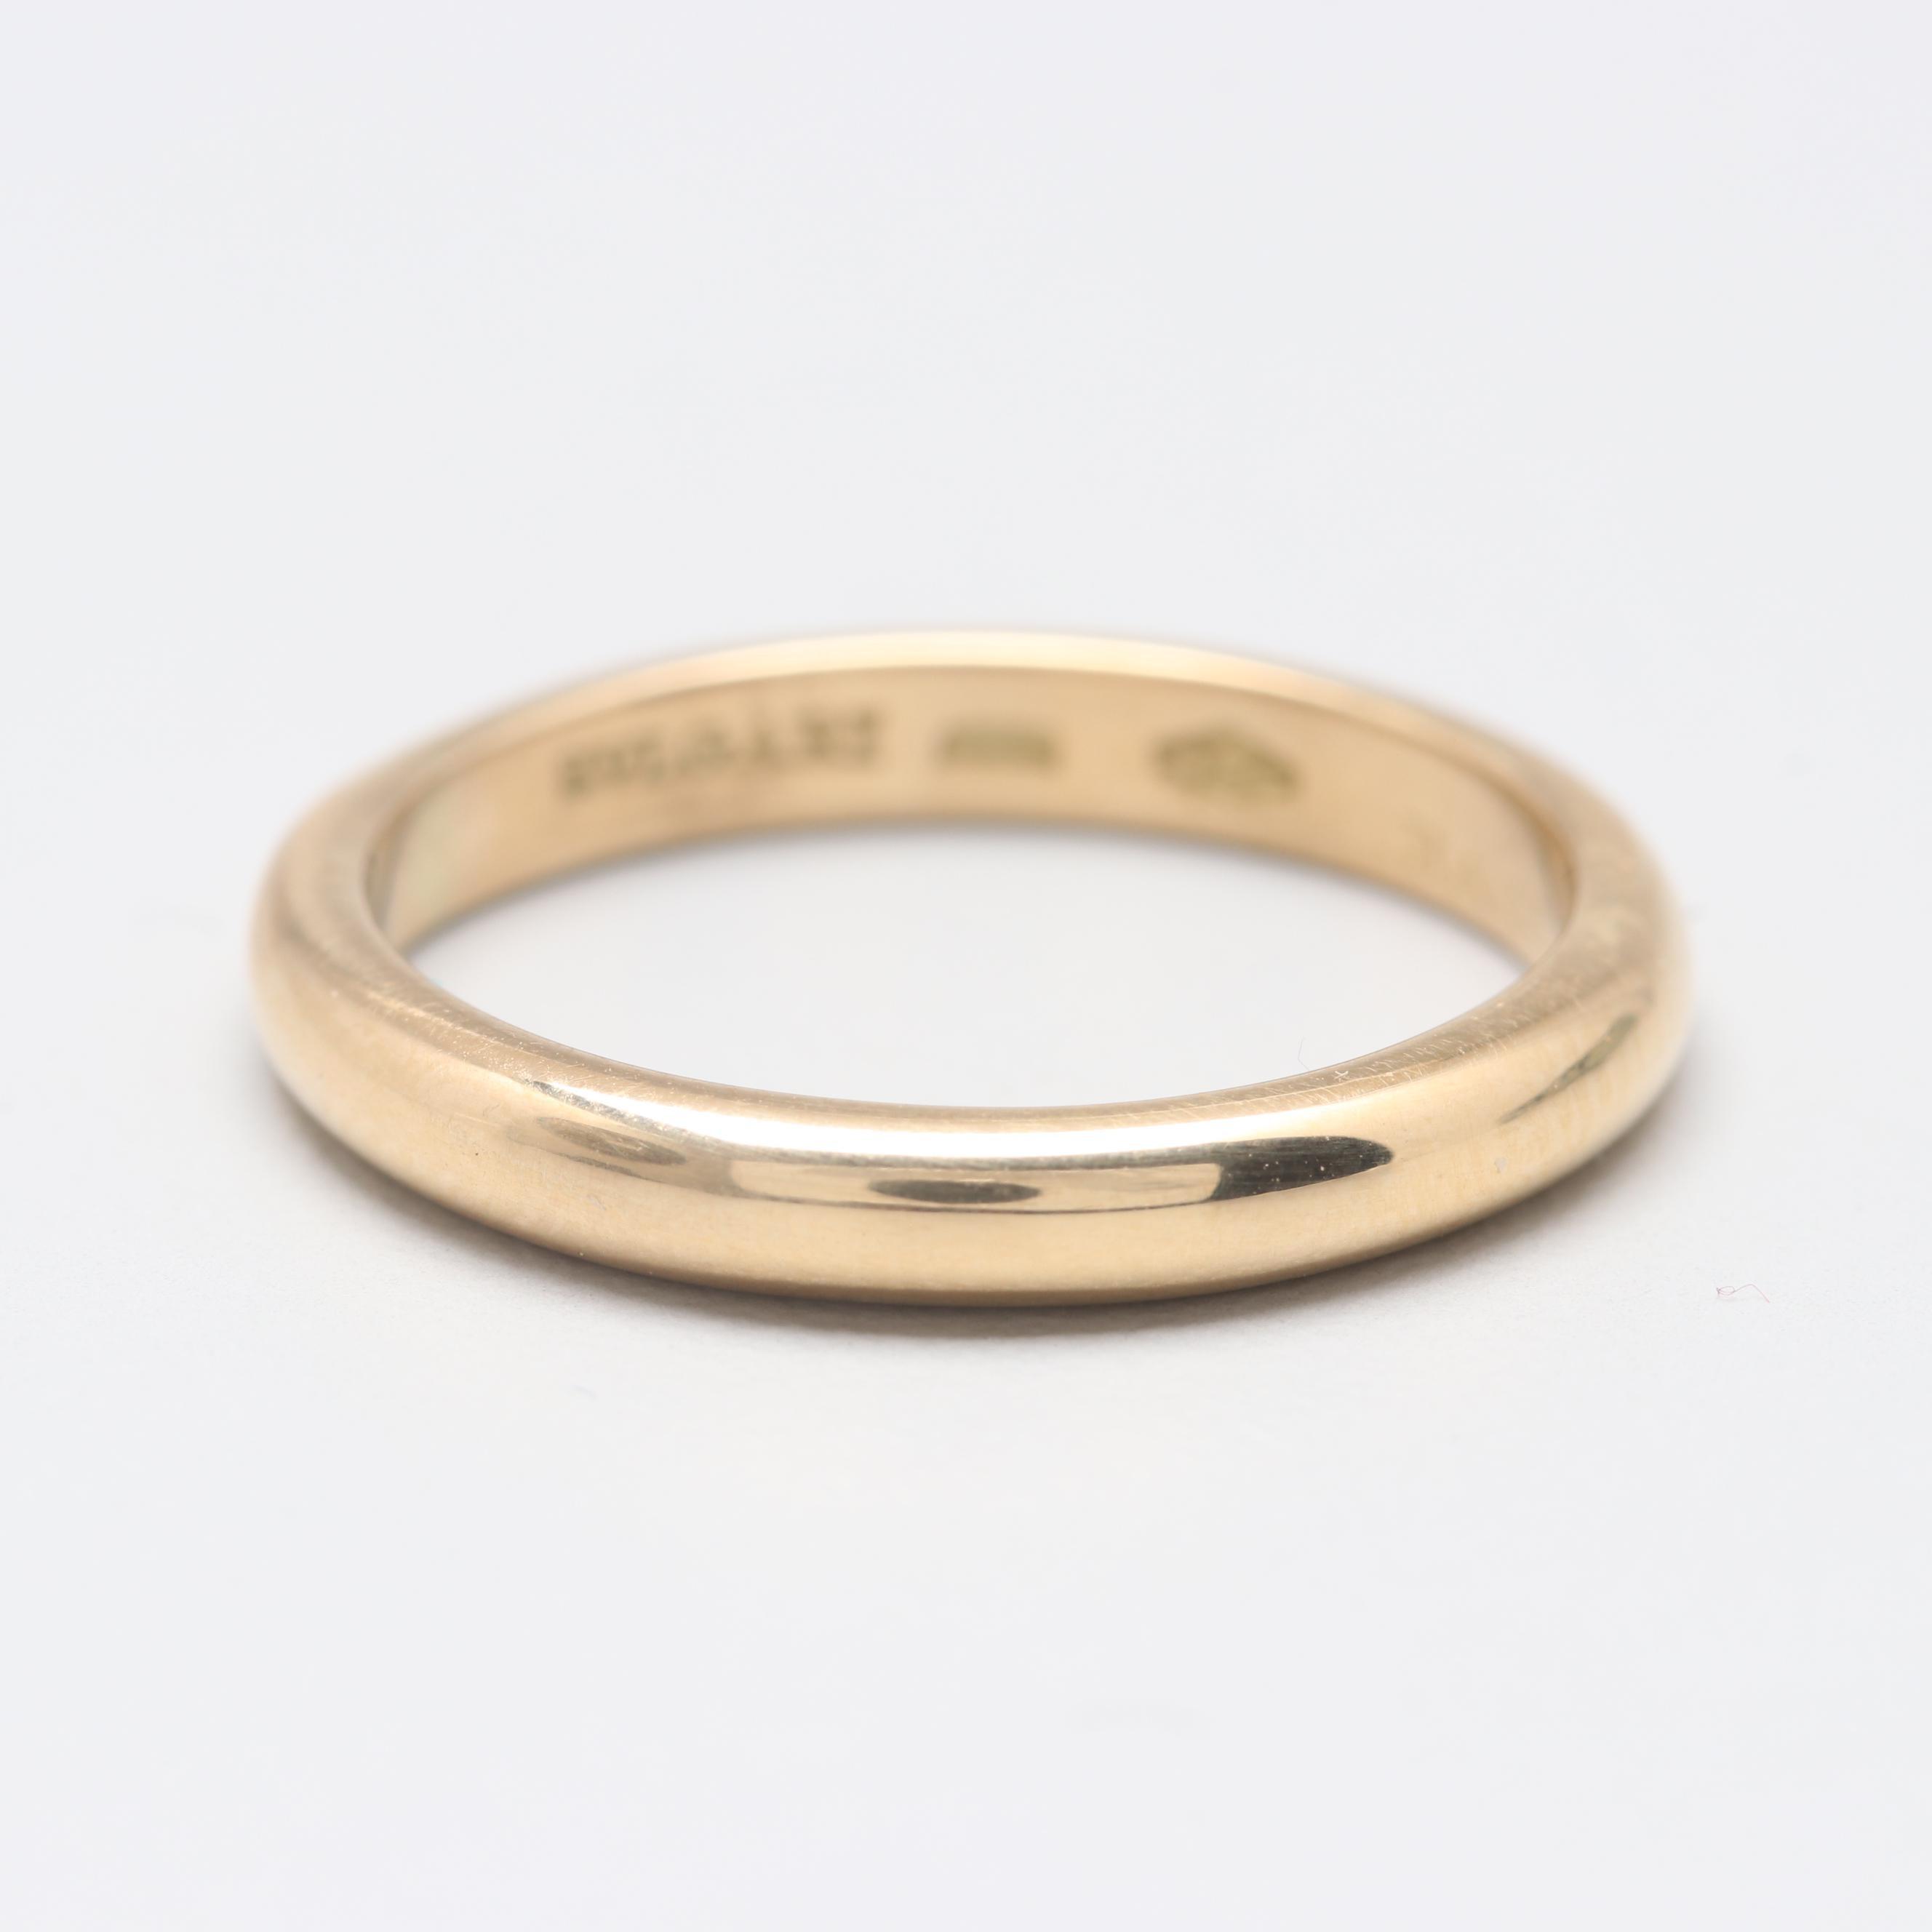 Bulgari 18K Yellow Gold Ring Band